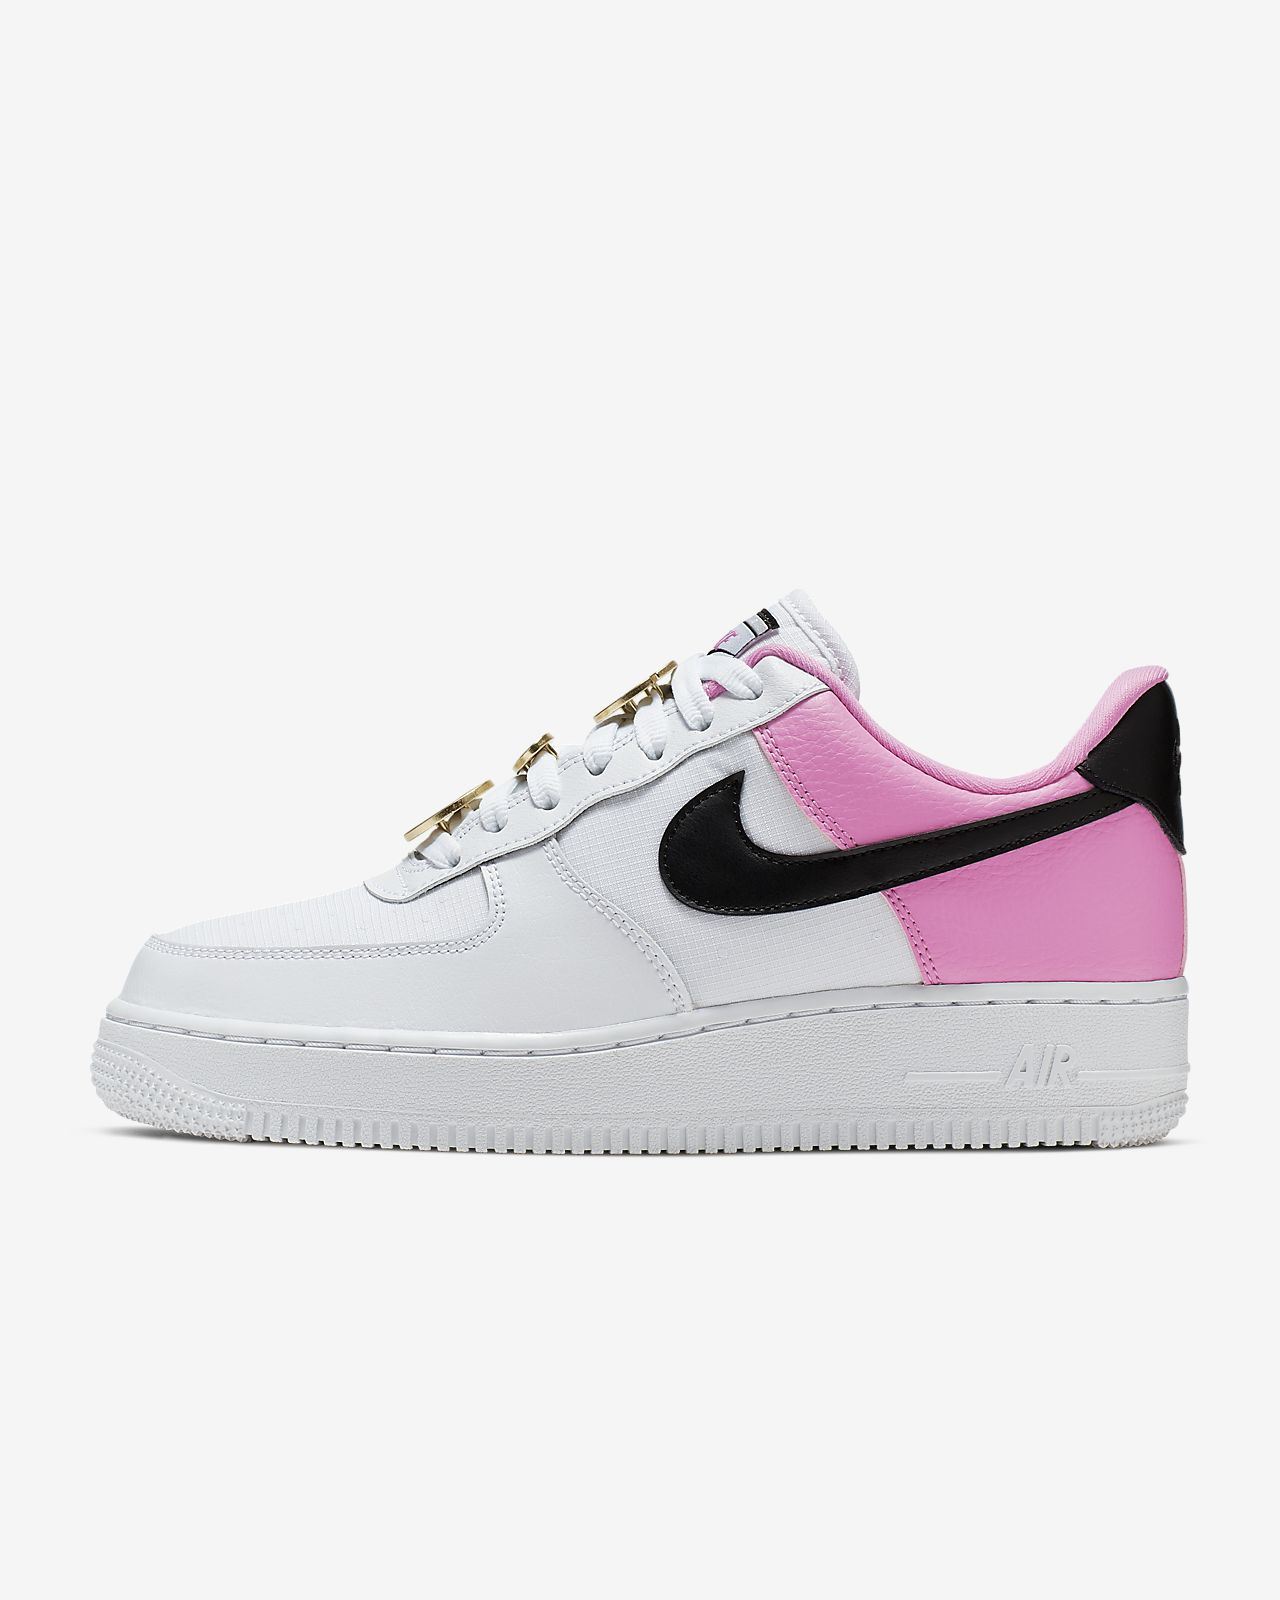 dbafce6e88397 Nike Air Force 1 '07 SE Women's Shoe. Nike.com